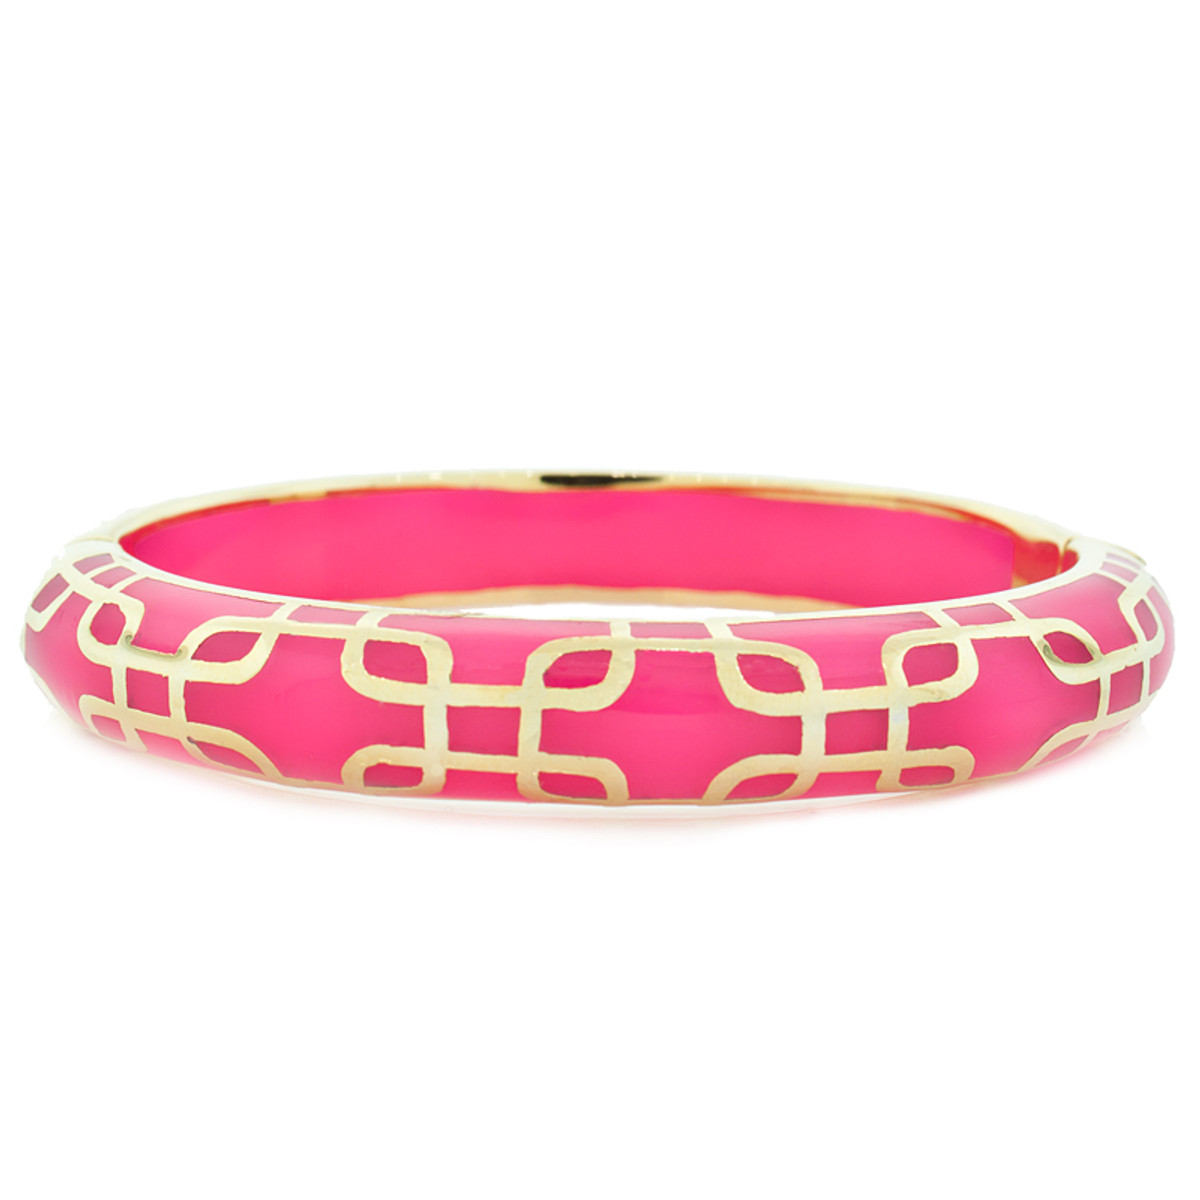 Andrew Hamilton Crawford Bracelet Sailor Pink and Gold